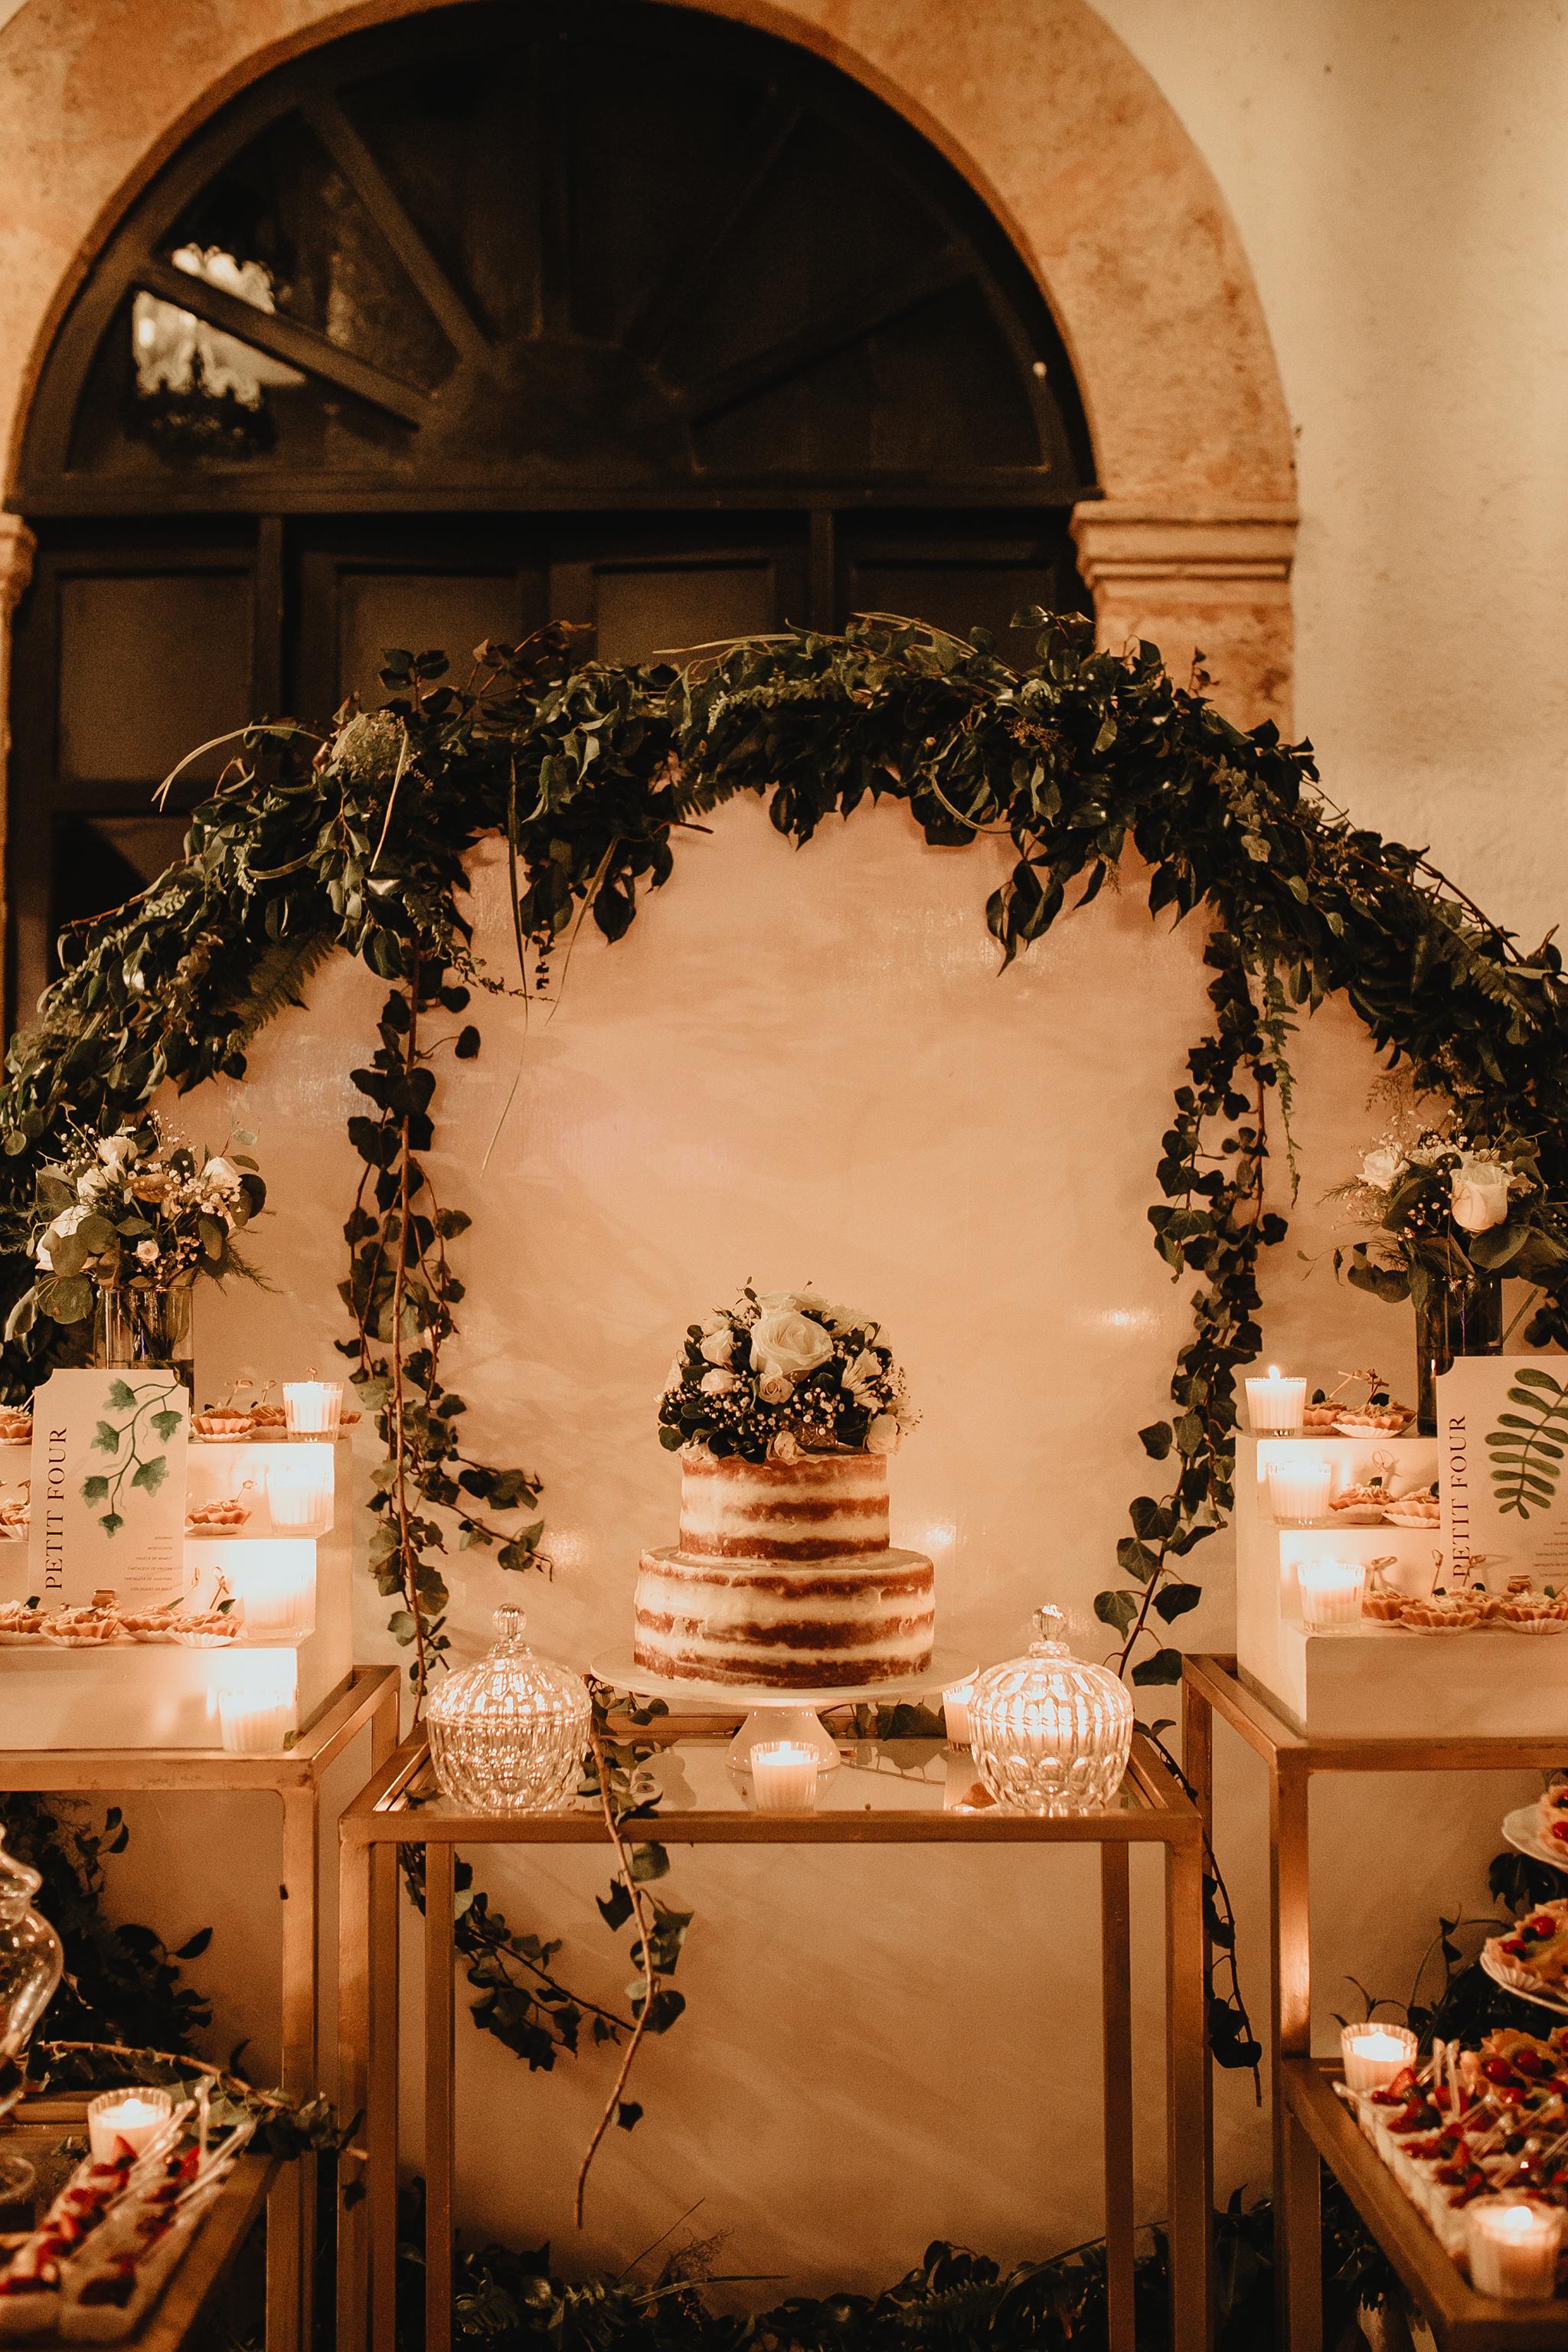 0946R&F__WeddingDestination_Weddingmerida_BodaMexico_FotografoDeBodas_FabrizioSimoneenFotografo.jpg